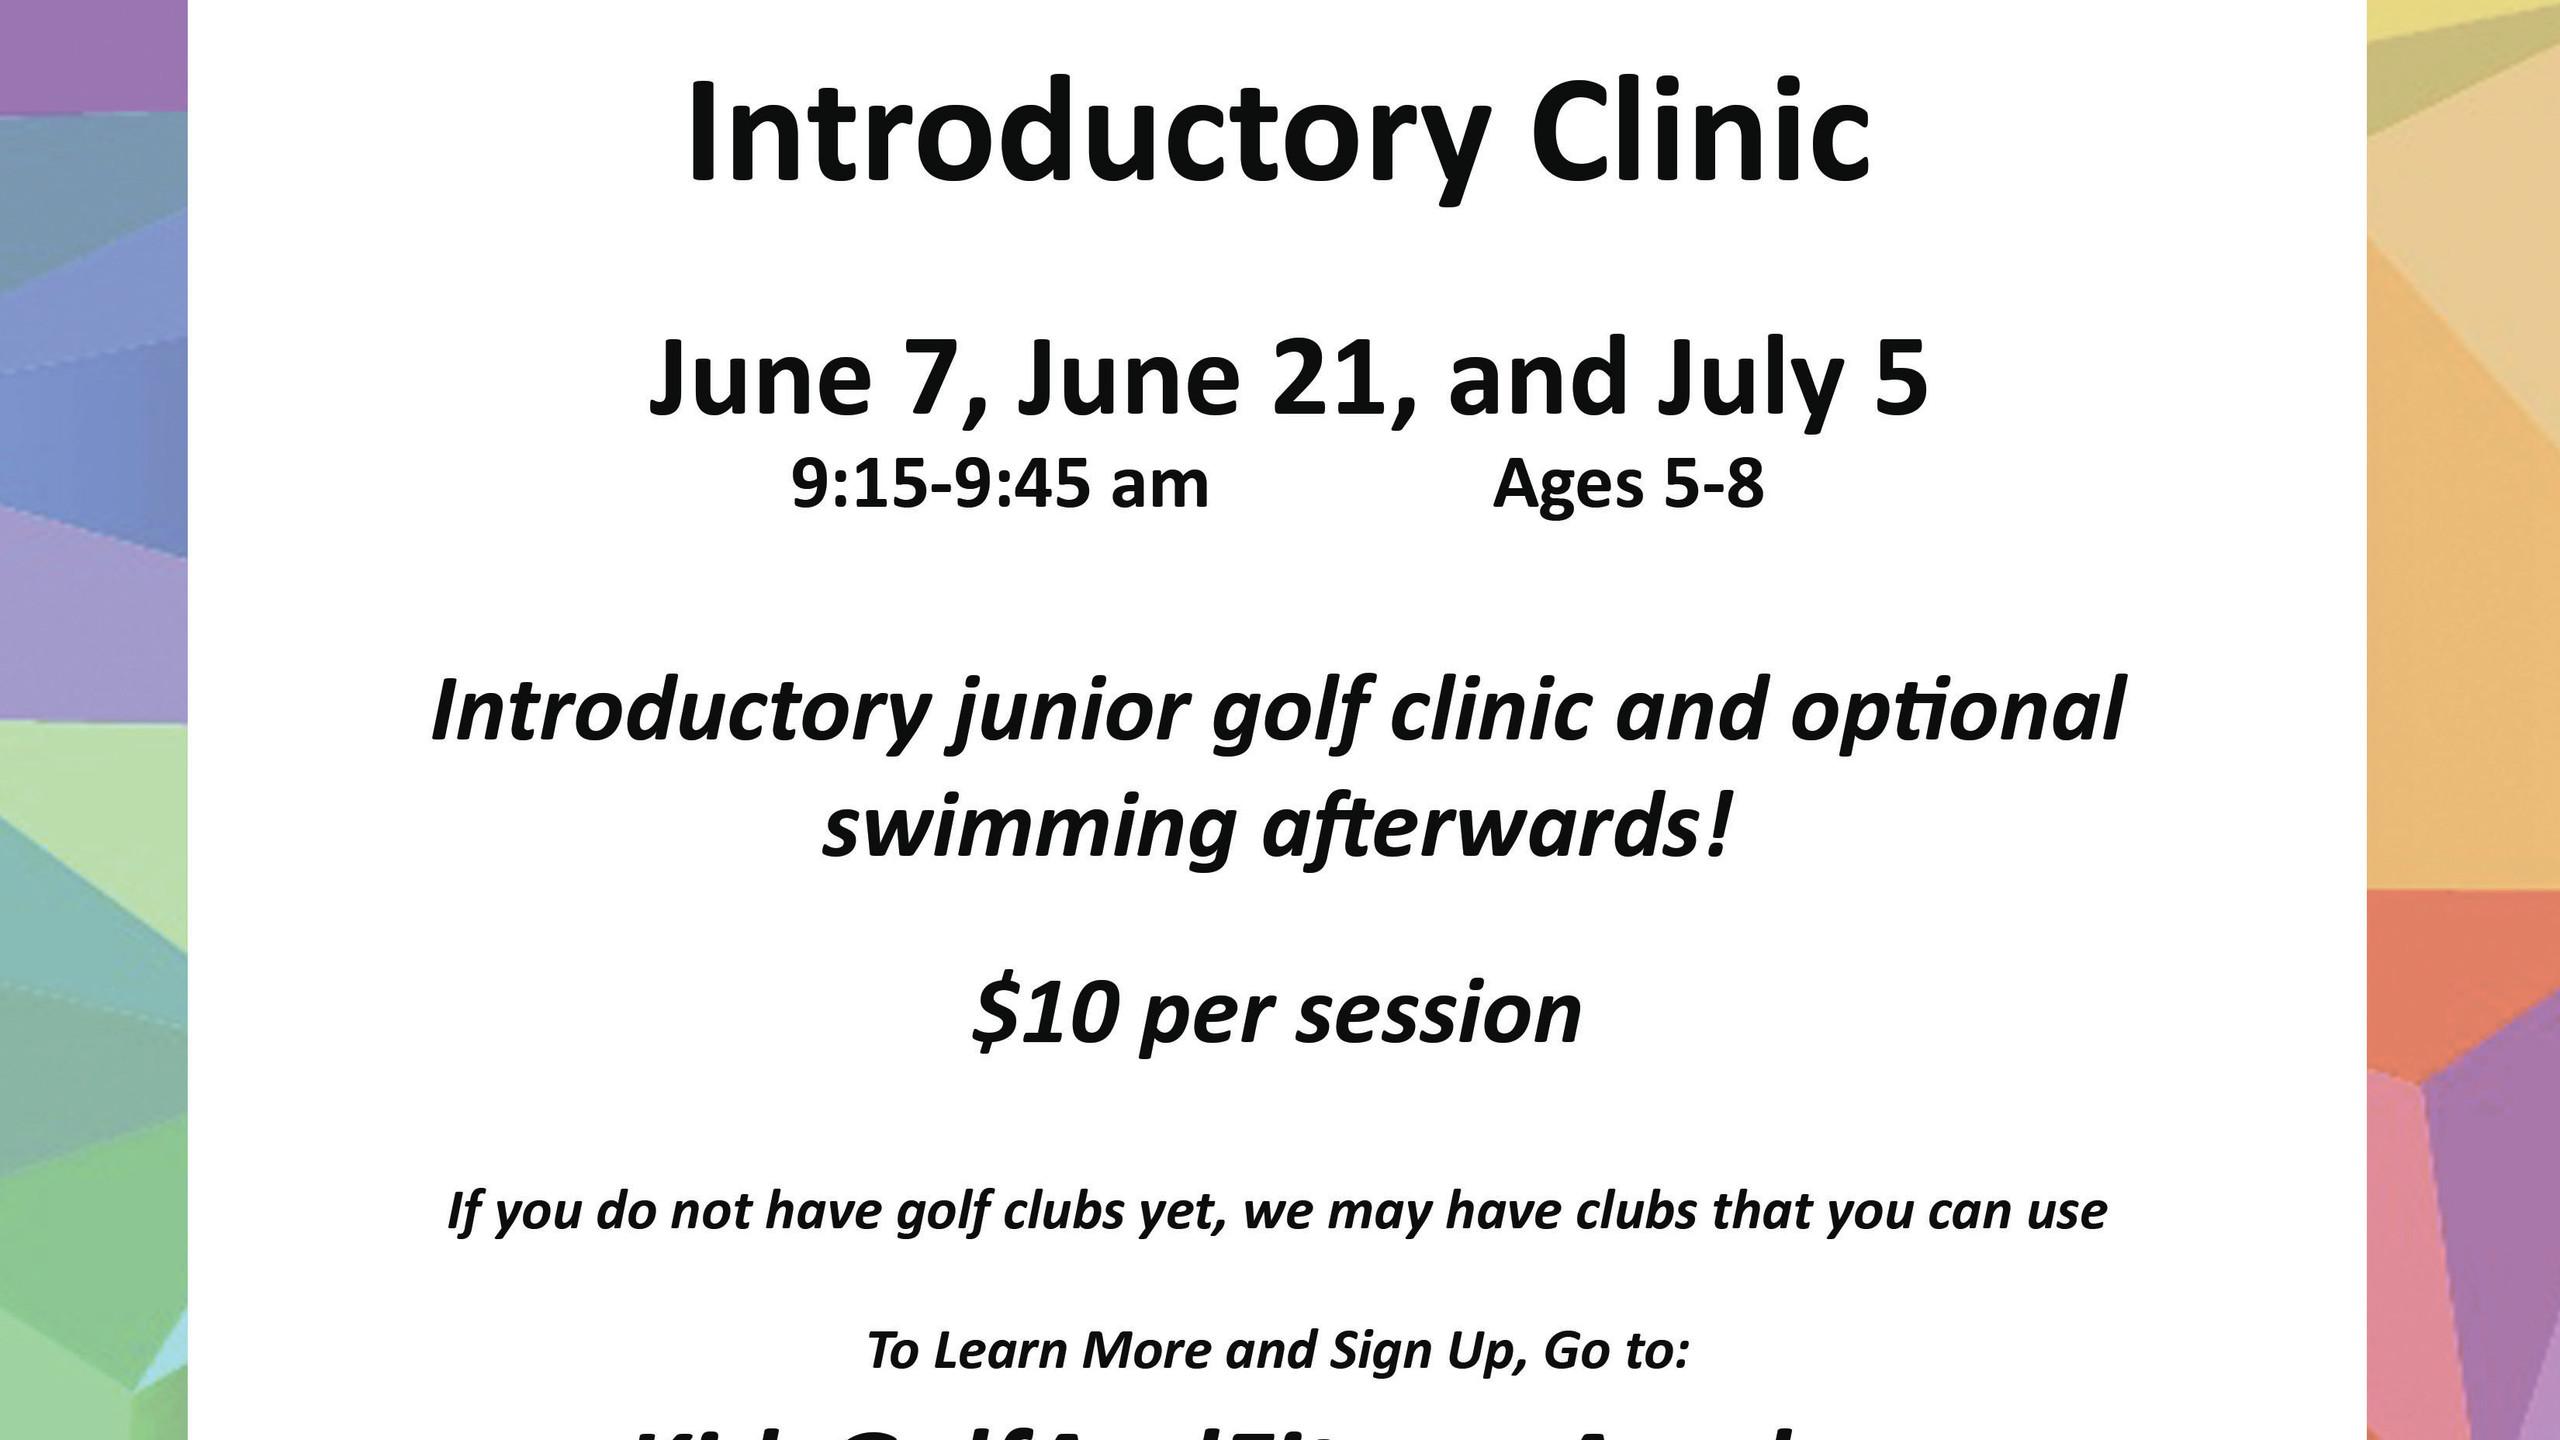 kgfa-junior golf clinic